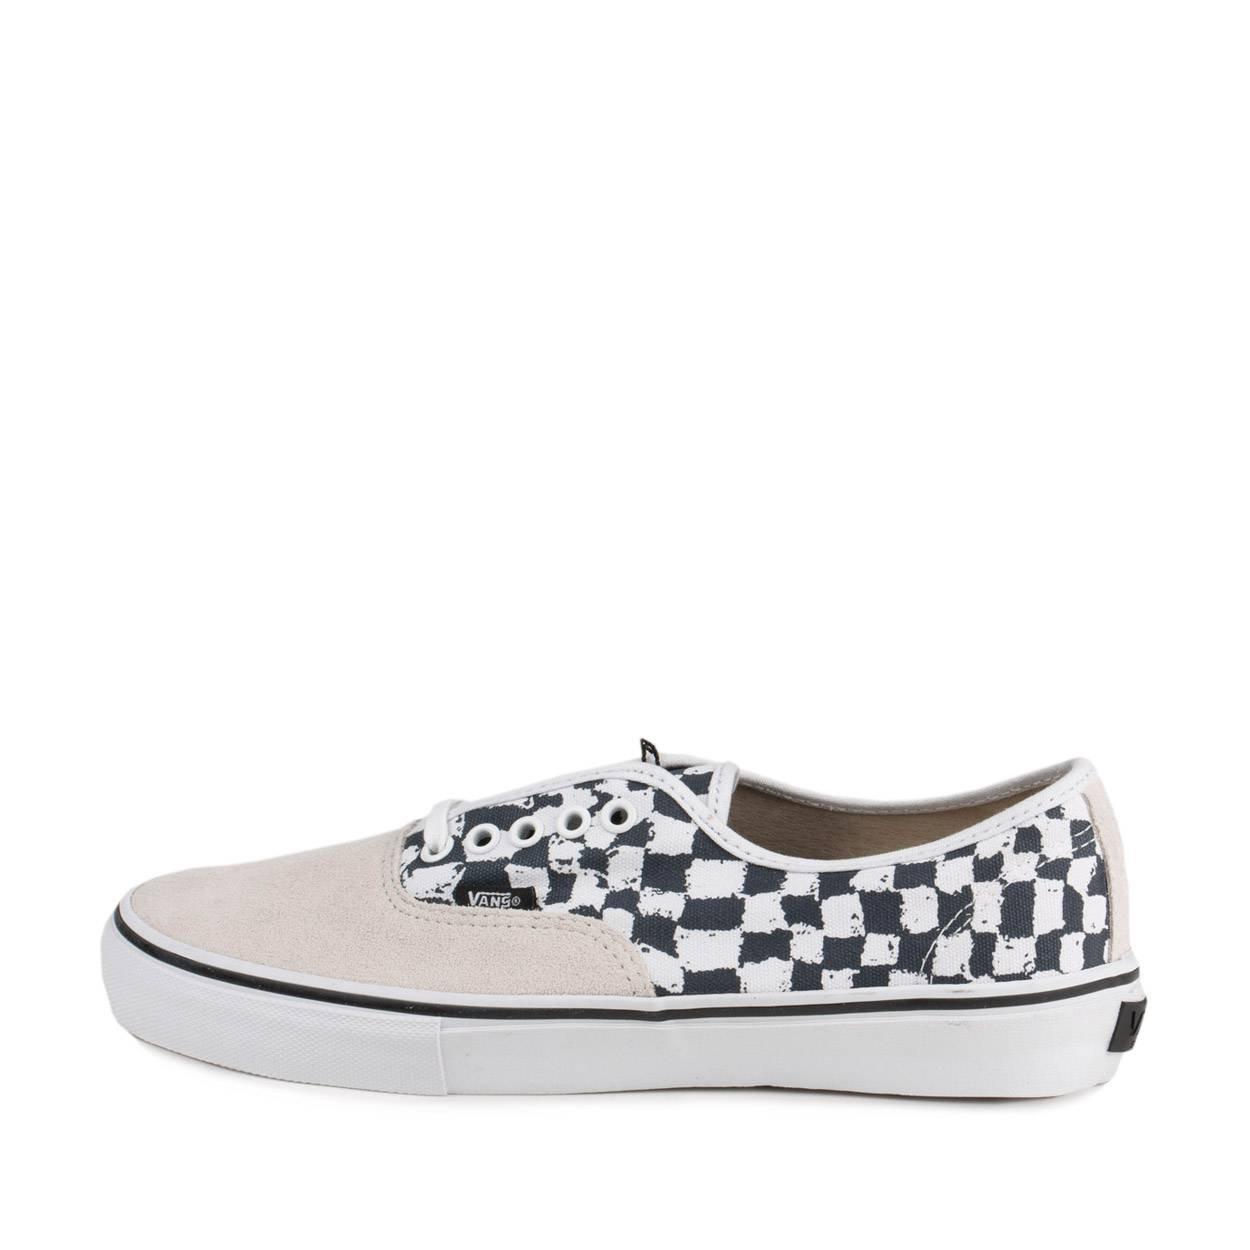 2ee4c05aaf Vans Men s Technical Skateboarding Shoes Black Harmony KORINE White   Amazon.co.uk  Shoes   Bags